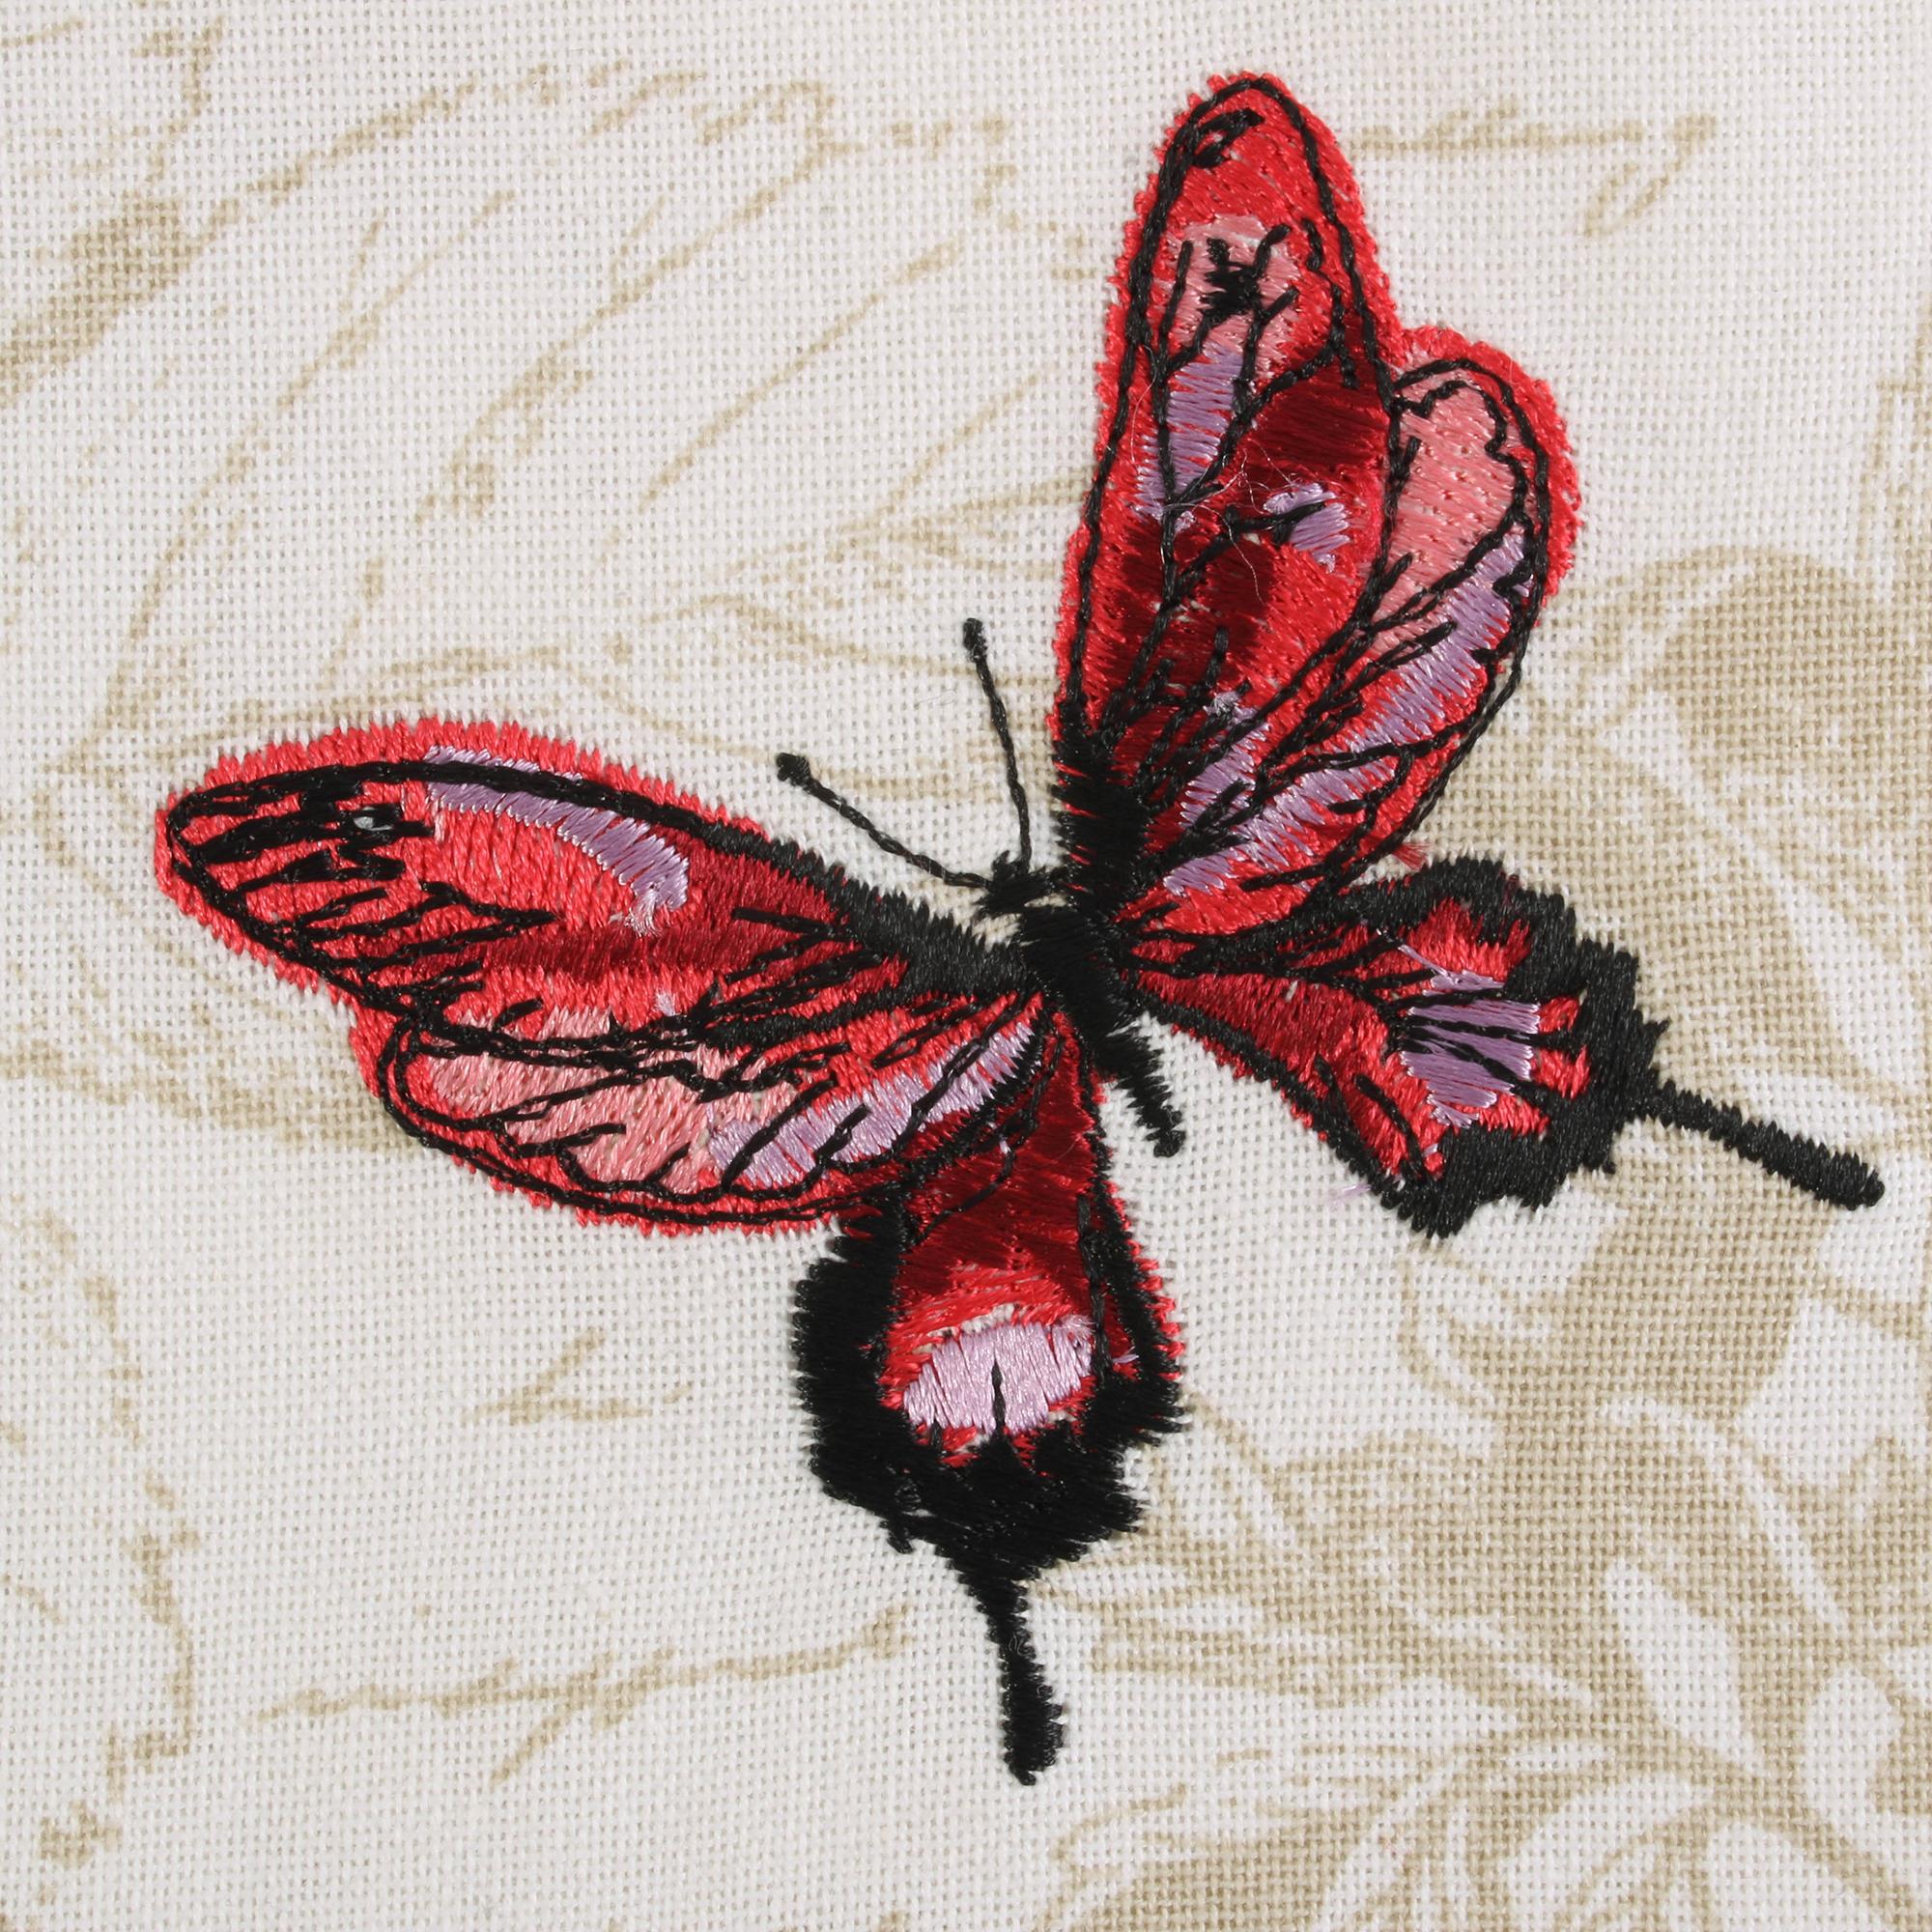 Botanical Print Kitchen Textiles, 20x20